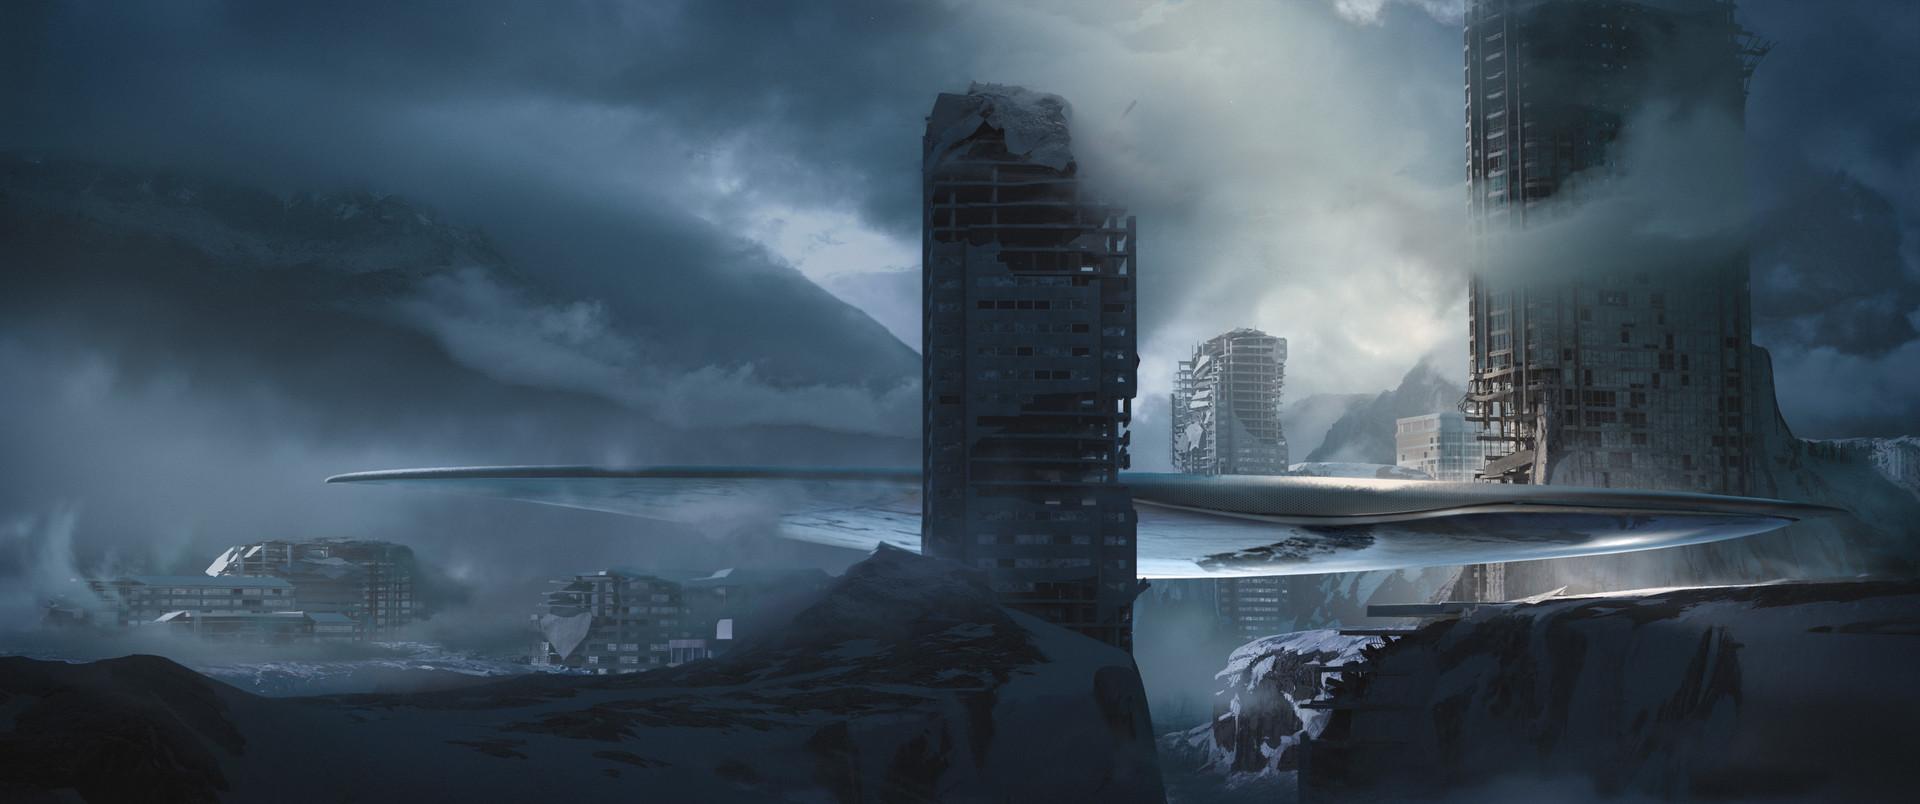 Darius kalinauskas conceptart environmetn scifi abandoned